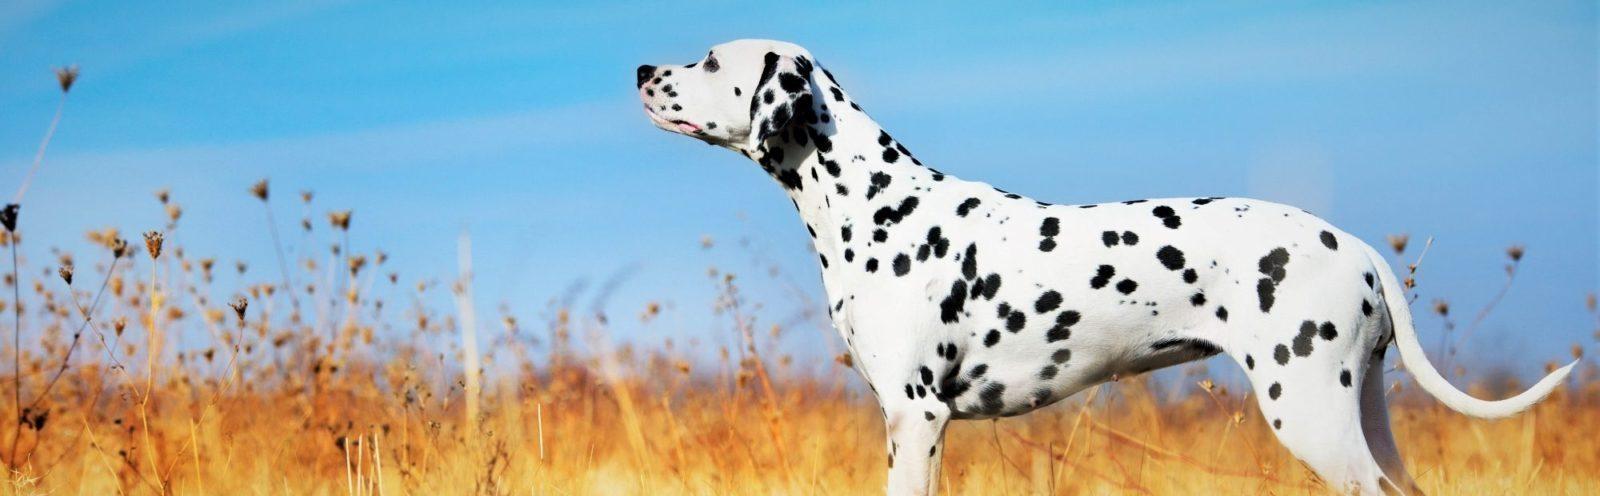 dalmatian in field dog